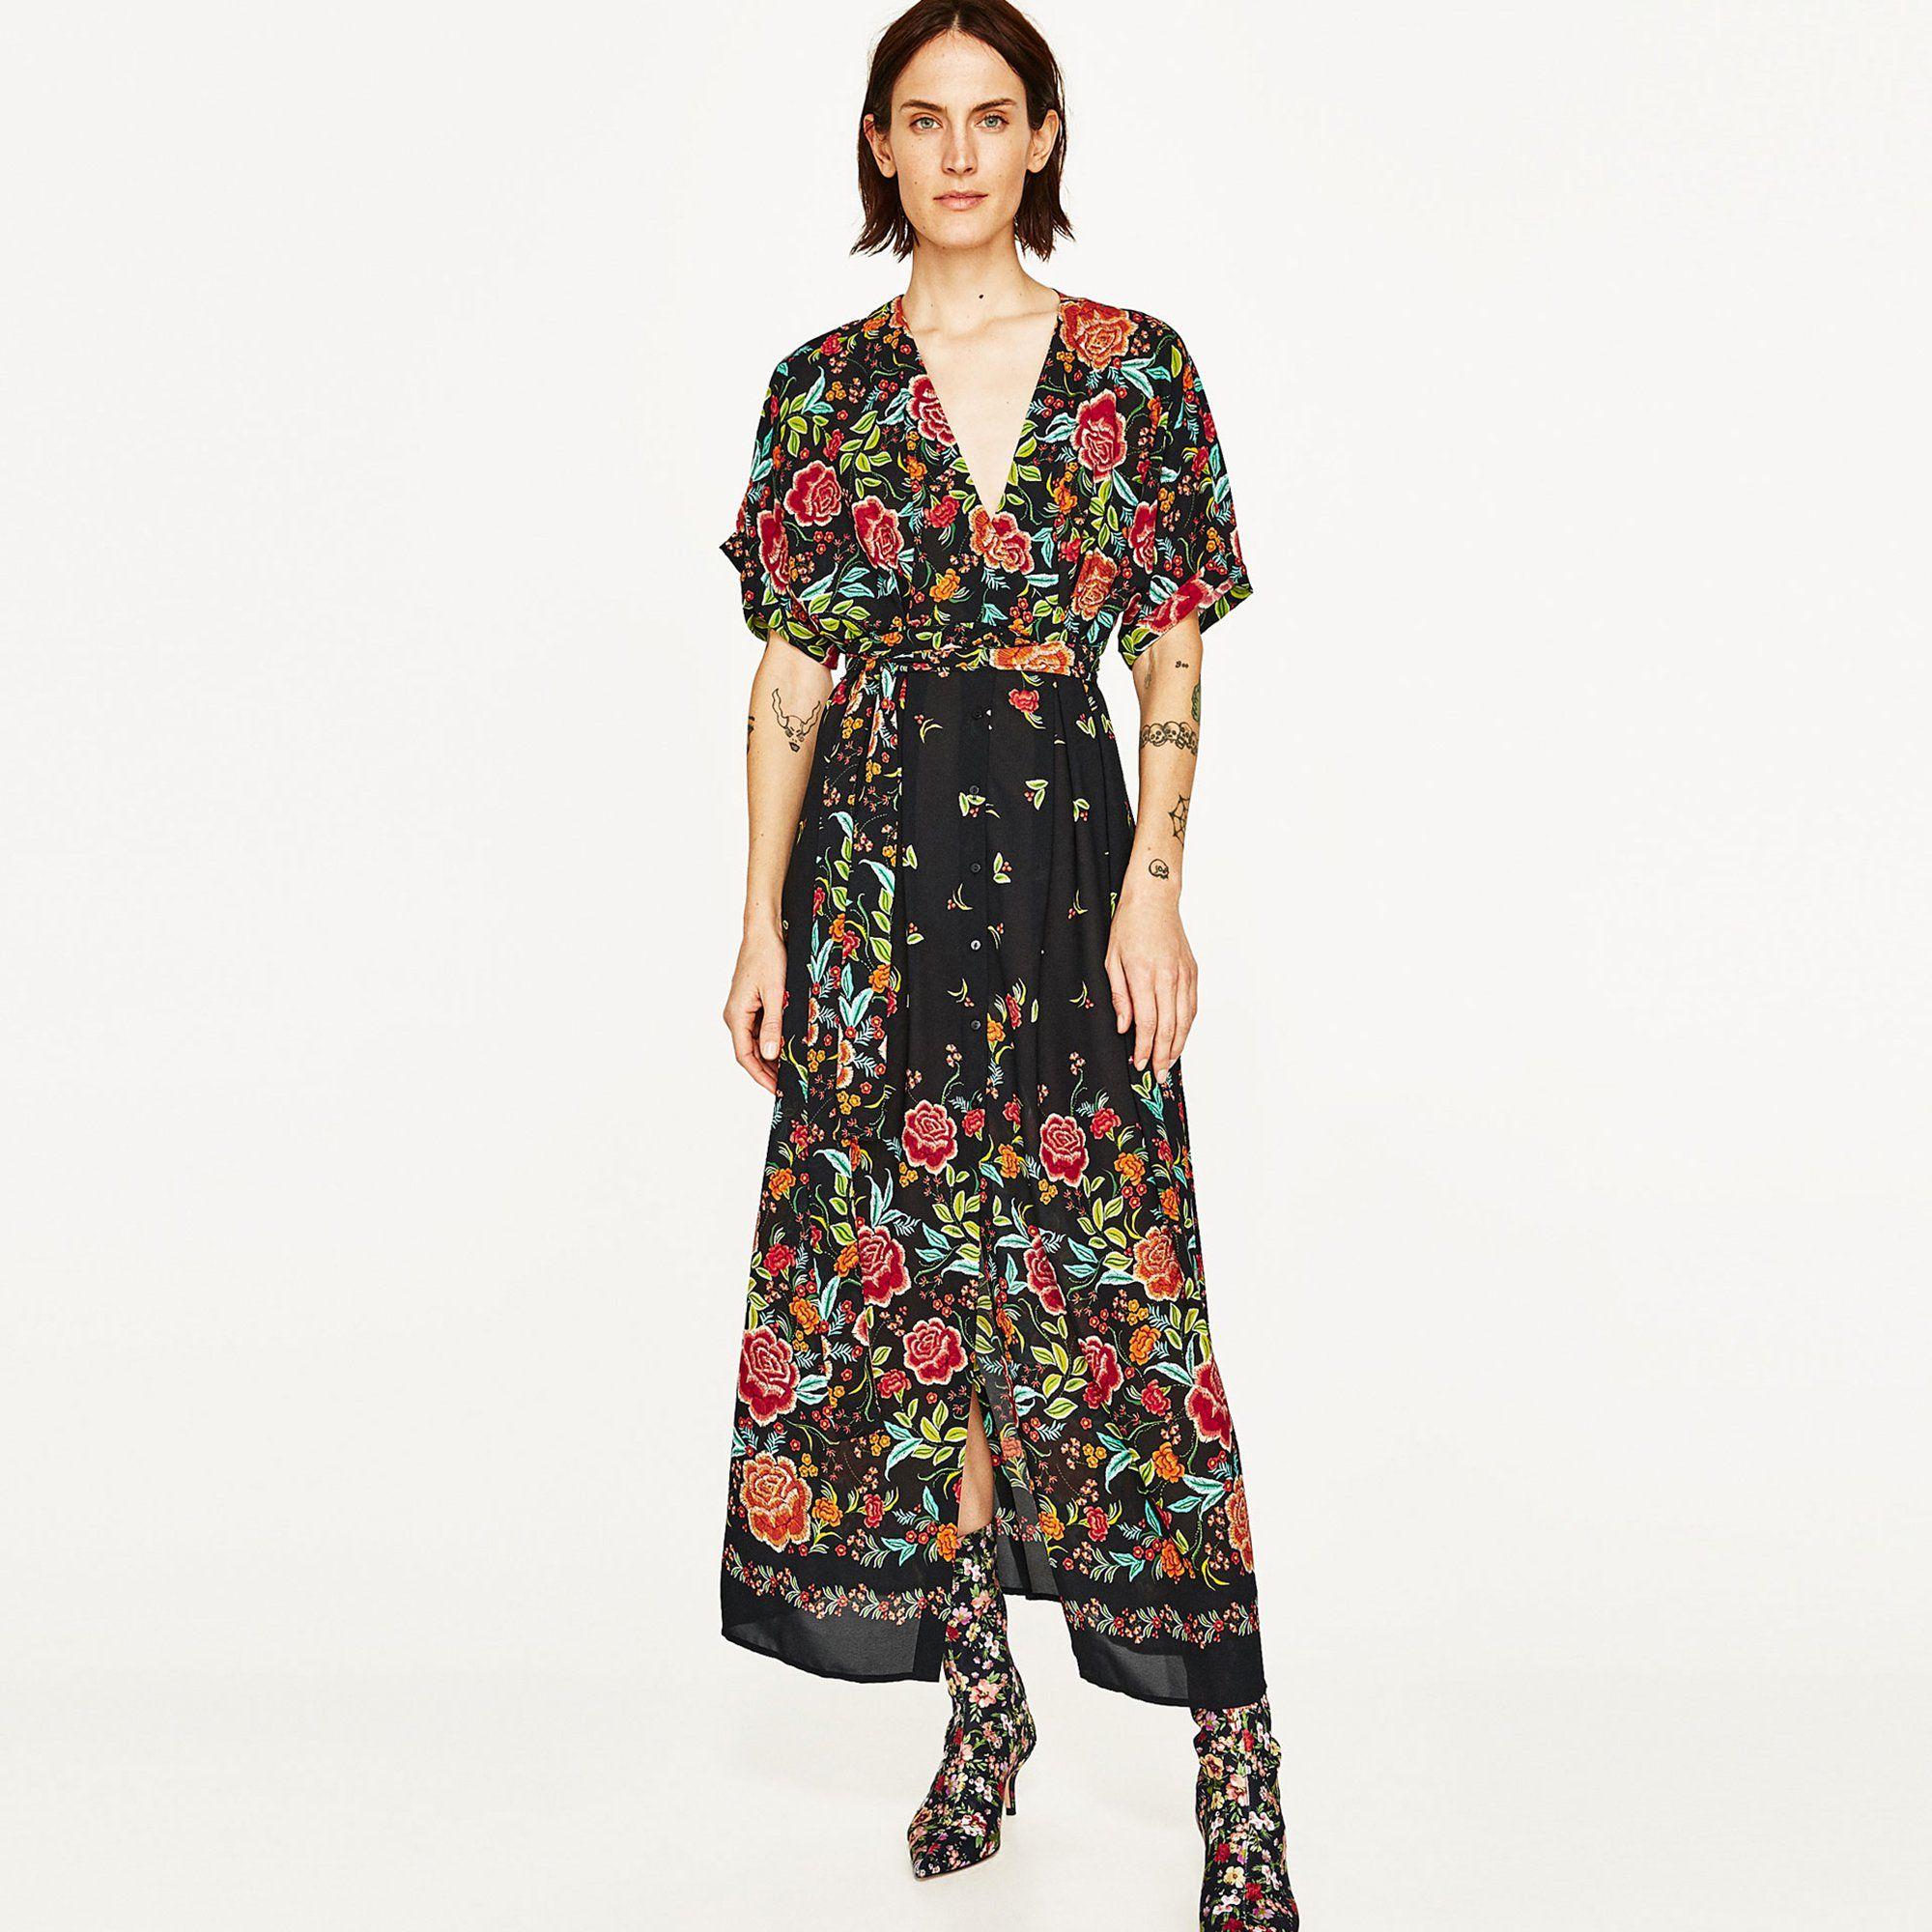 a6134abae62 Robes longues printemps été   une robe Zara